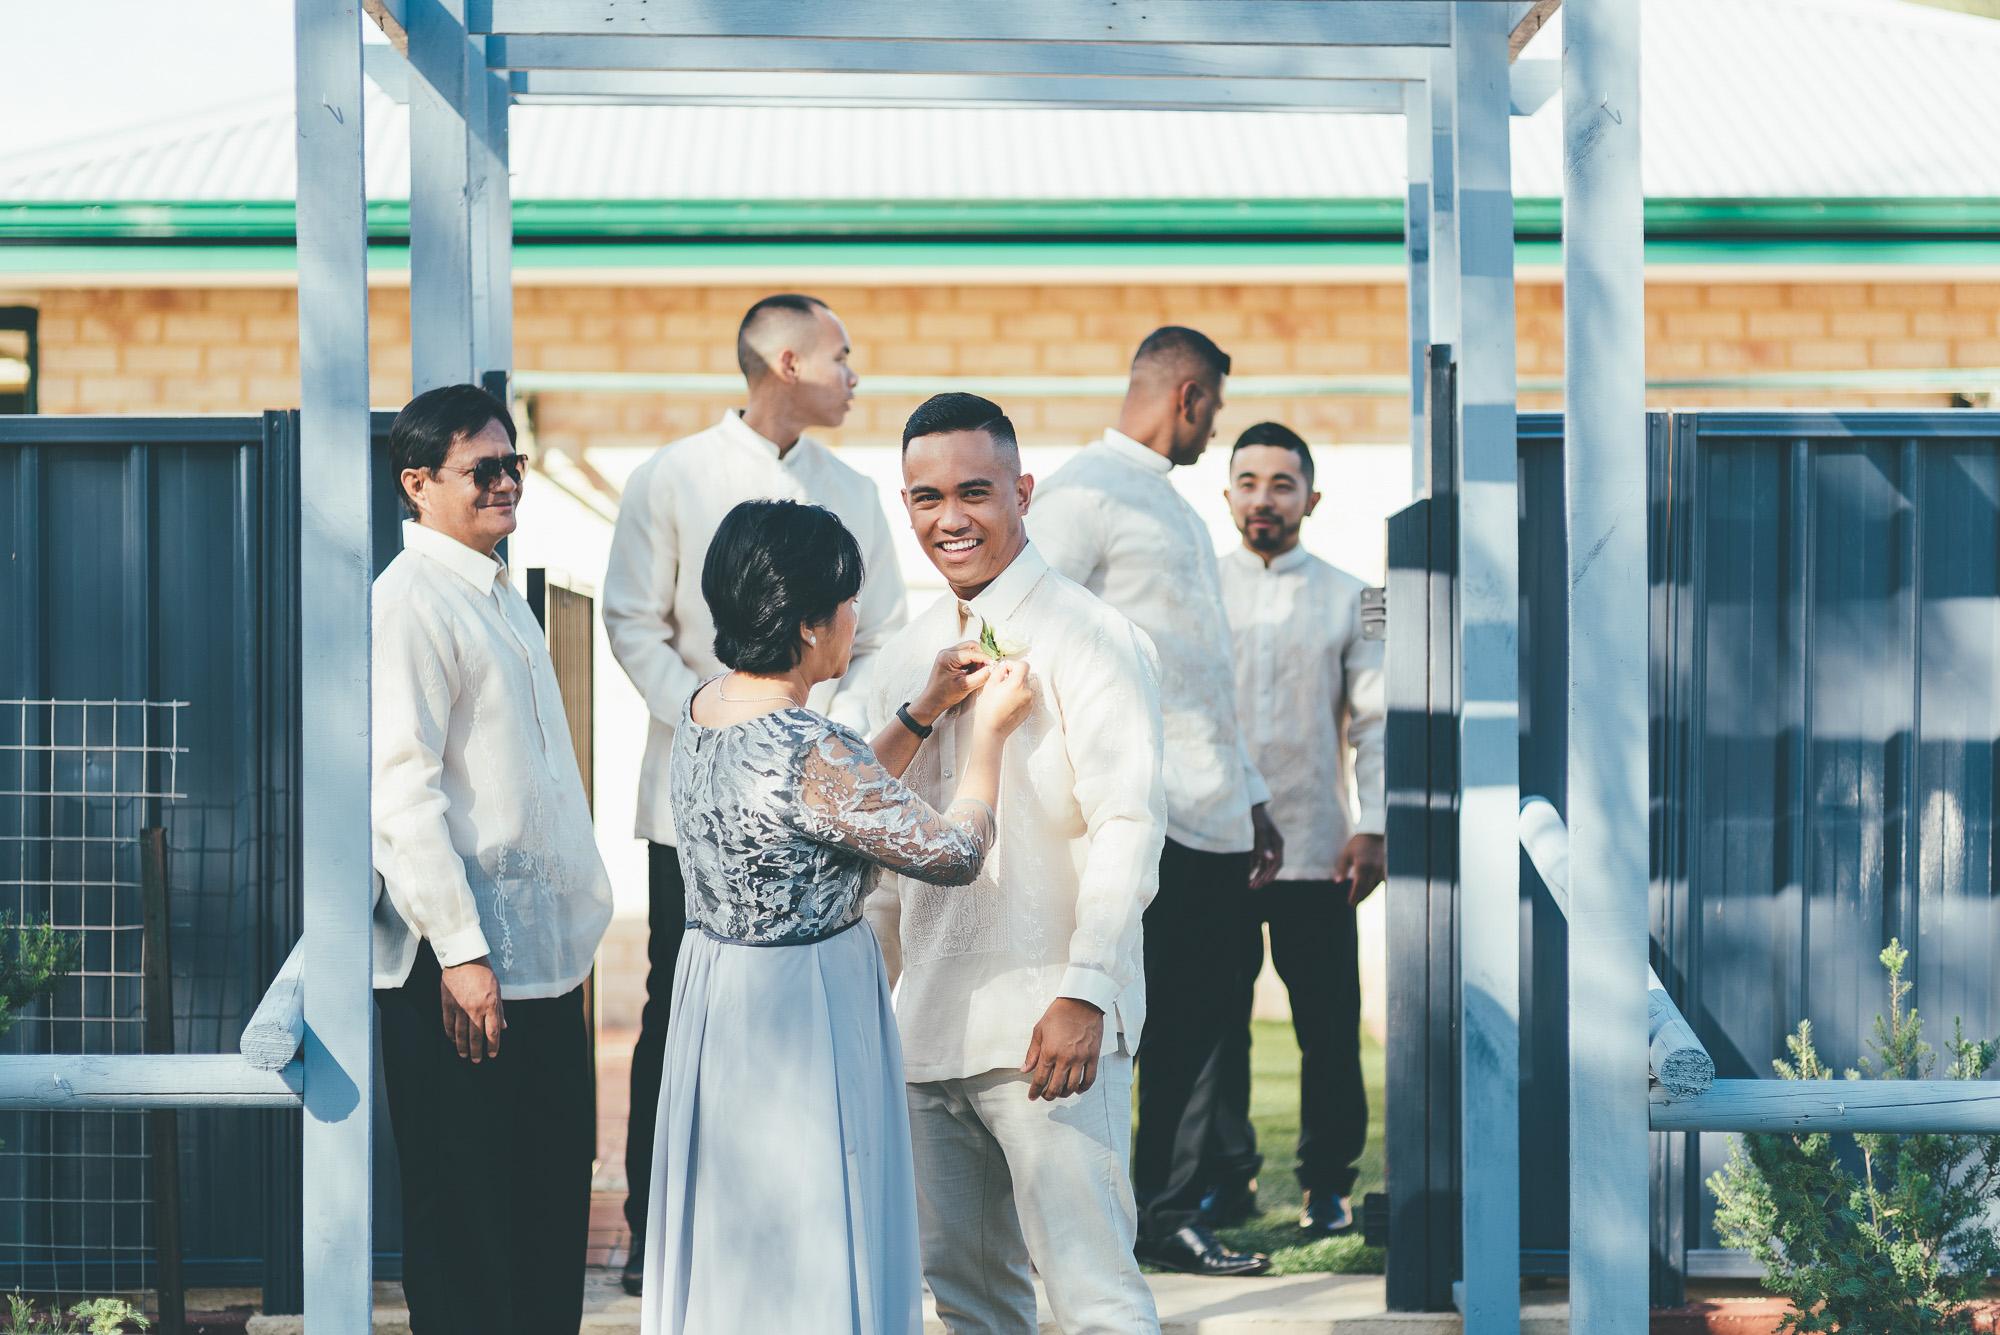 wedding-photographer-outdoor-casual-styled-los-angeles-australia-california-international-earthbound -22.jpg